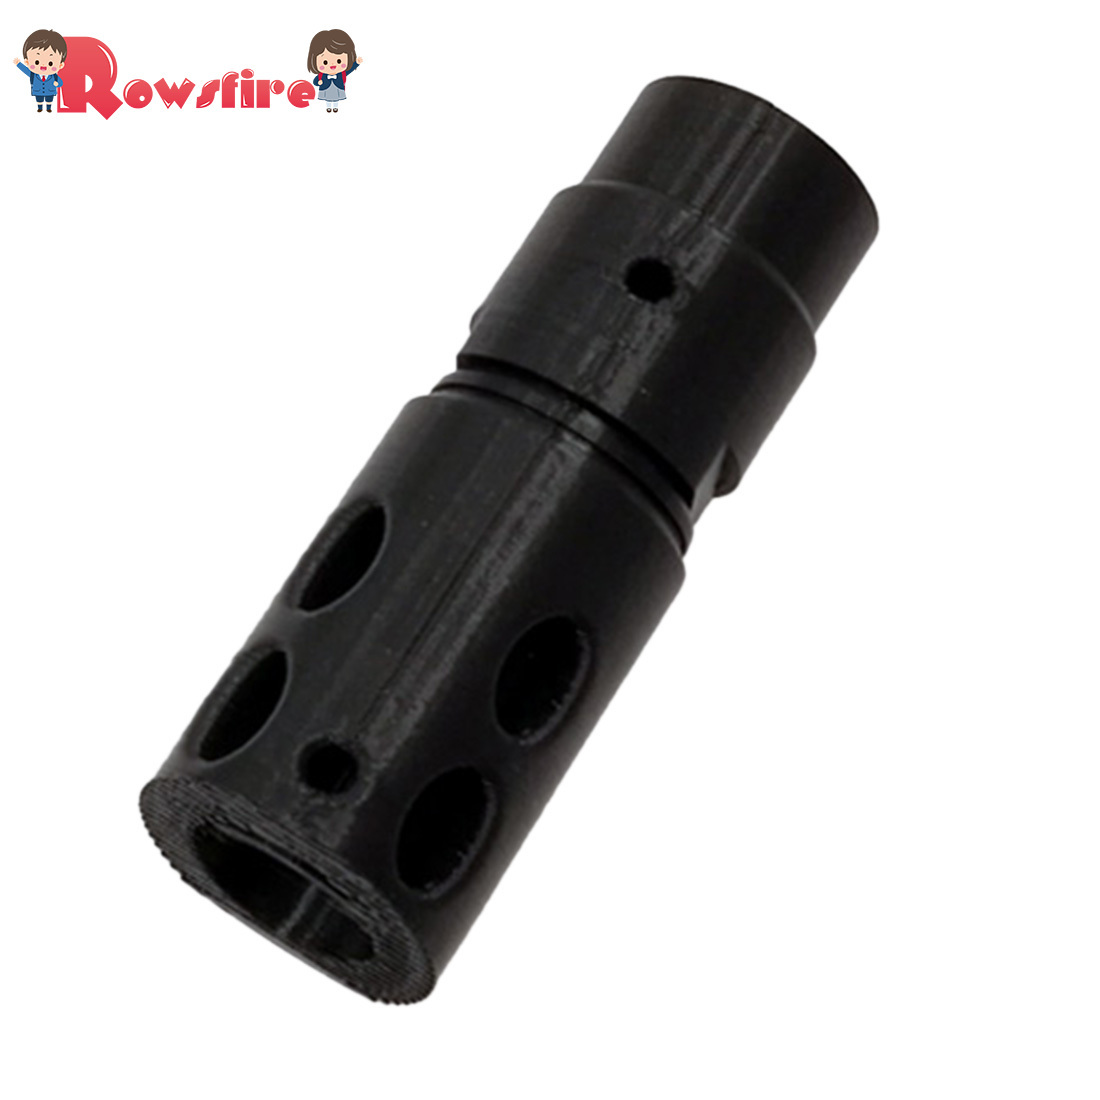 DK Adjustable Straight Hop Up For BF P90 Gen.3 Water Gel Beads Blaster - Black/Pink